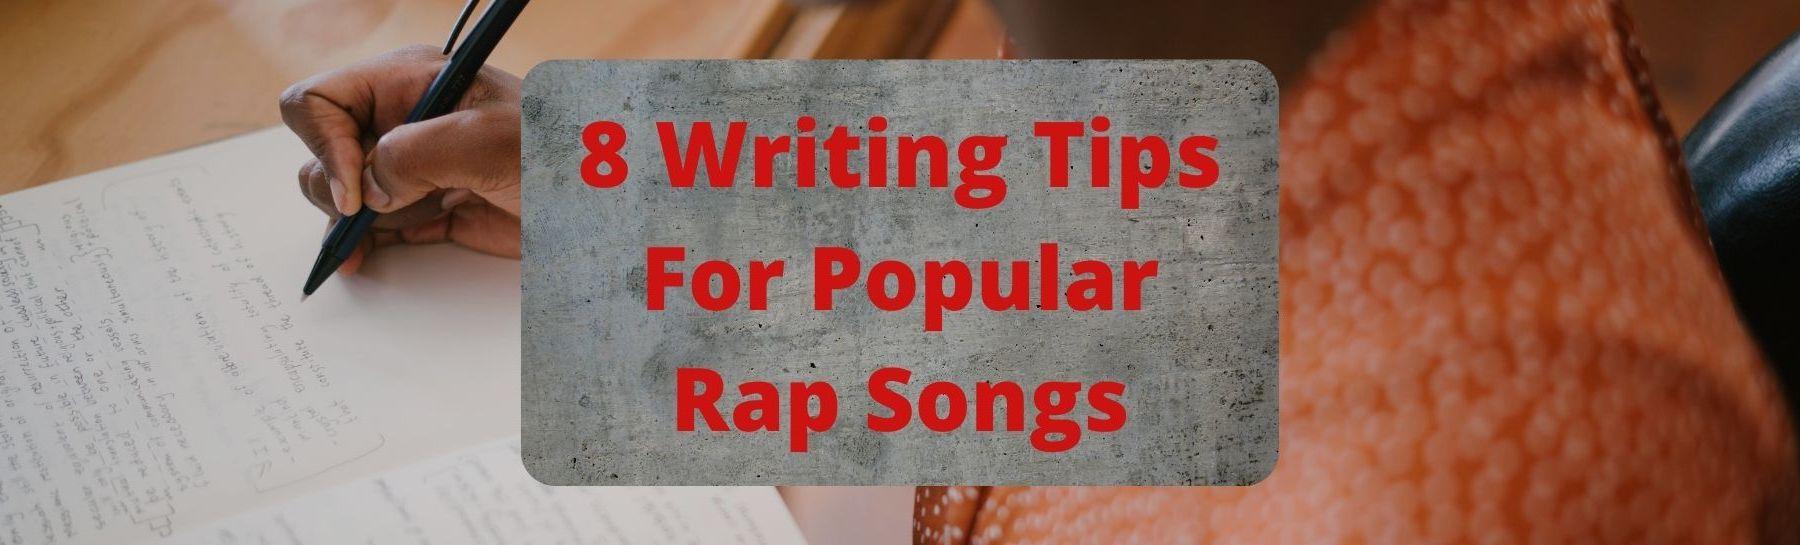 8 Writing Tips For Popular Rap Songs